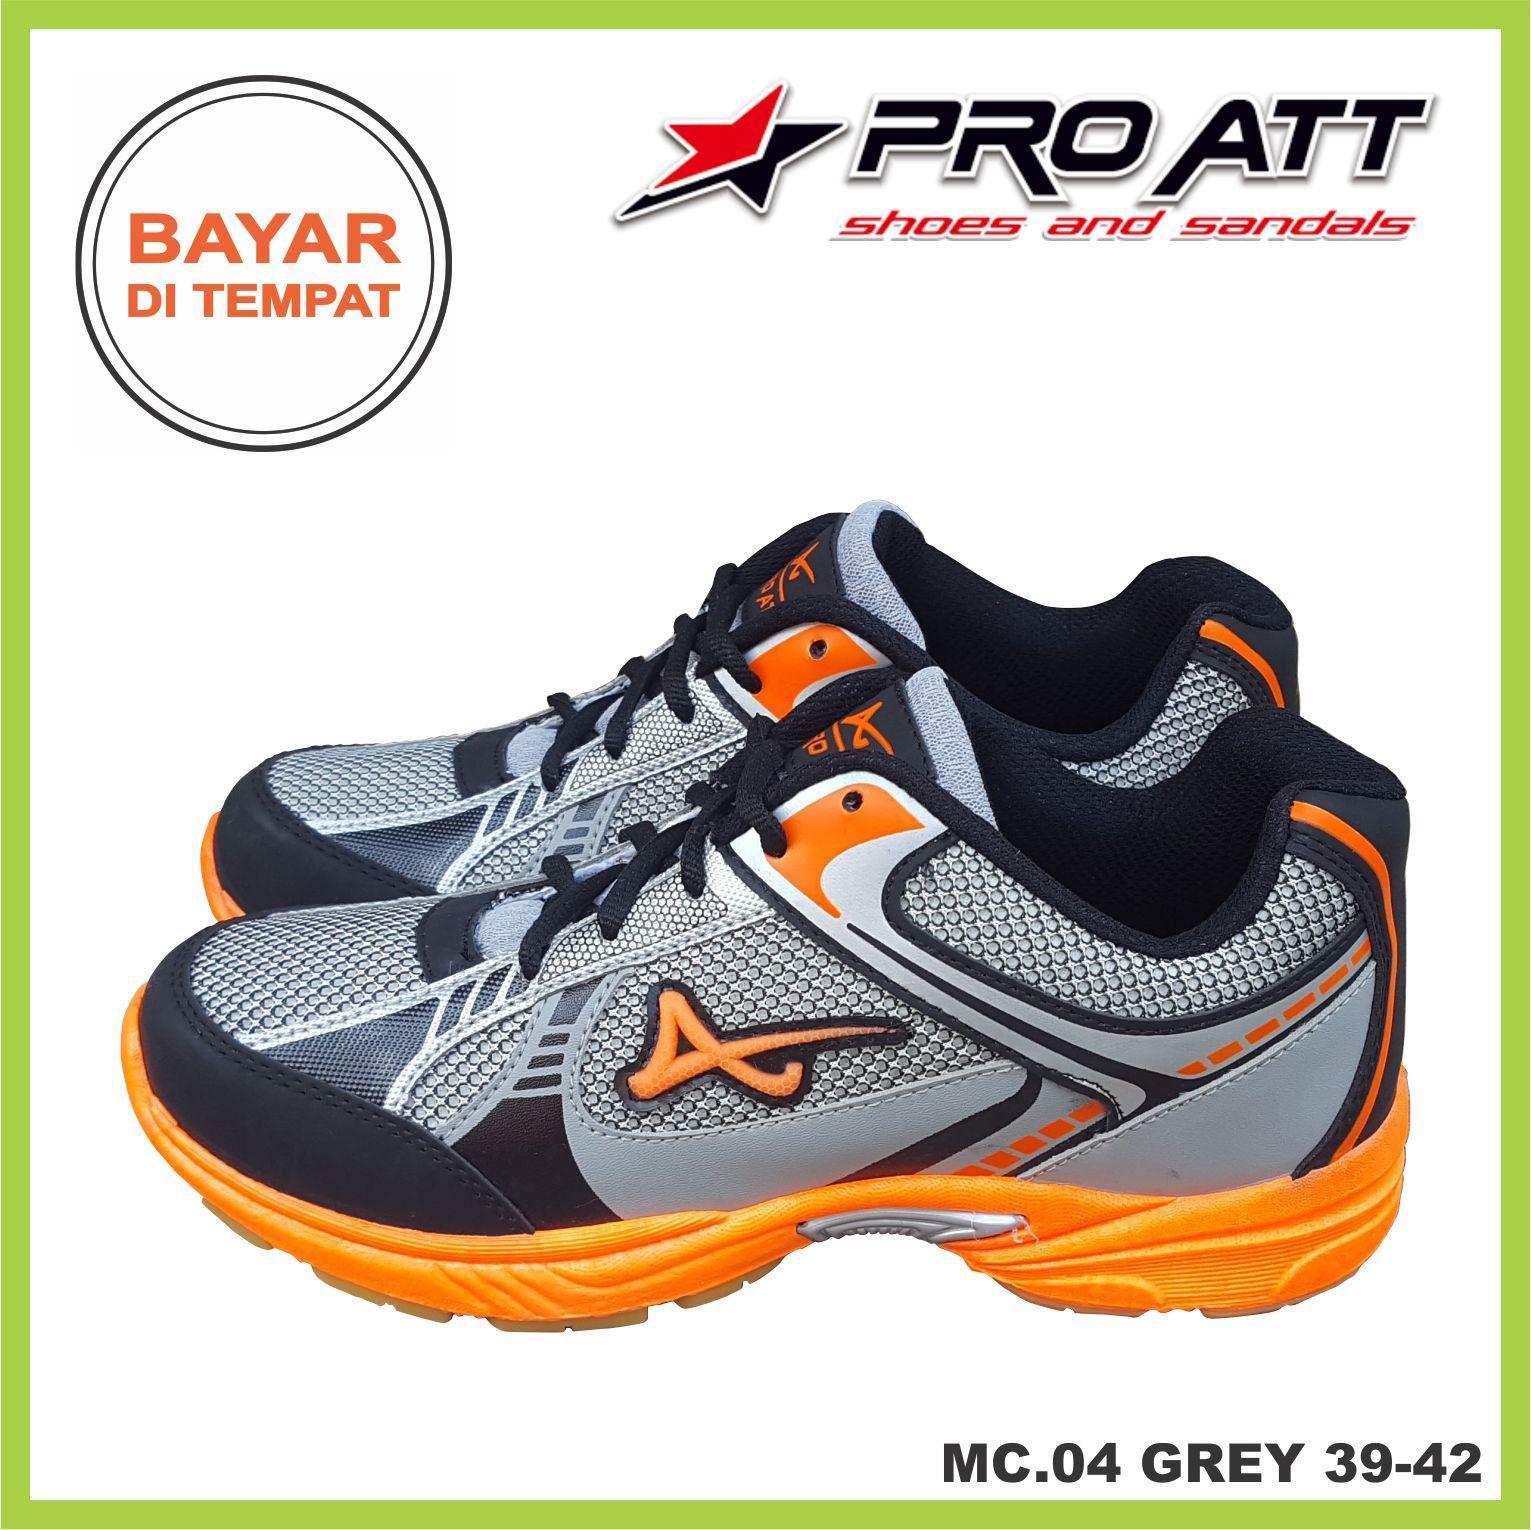 RAJASEPATU - PRO ATT Sepatu Pria / Sepatu Sneaker Original MC04 / TroyaStore Collection / Sepatu Sport Lari Murah Berqualitas